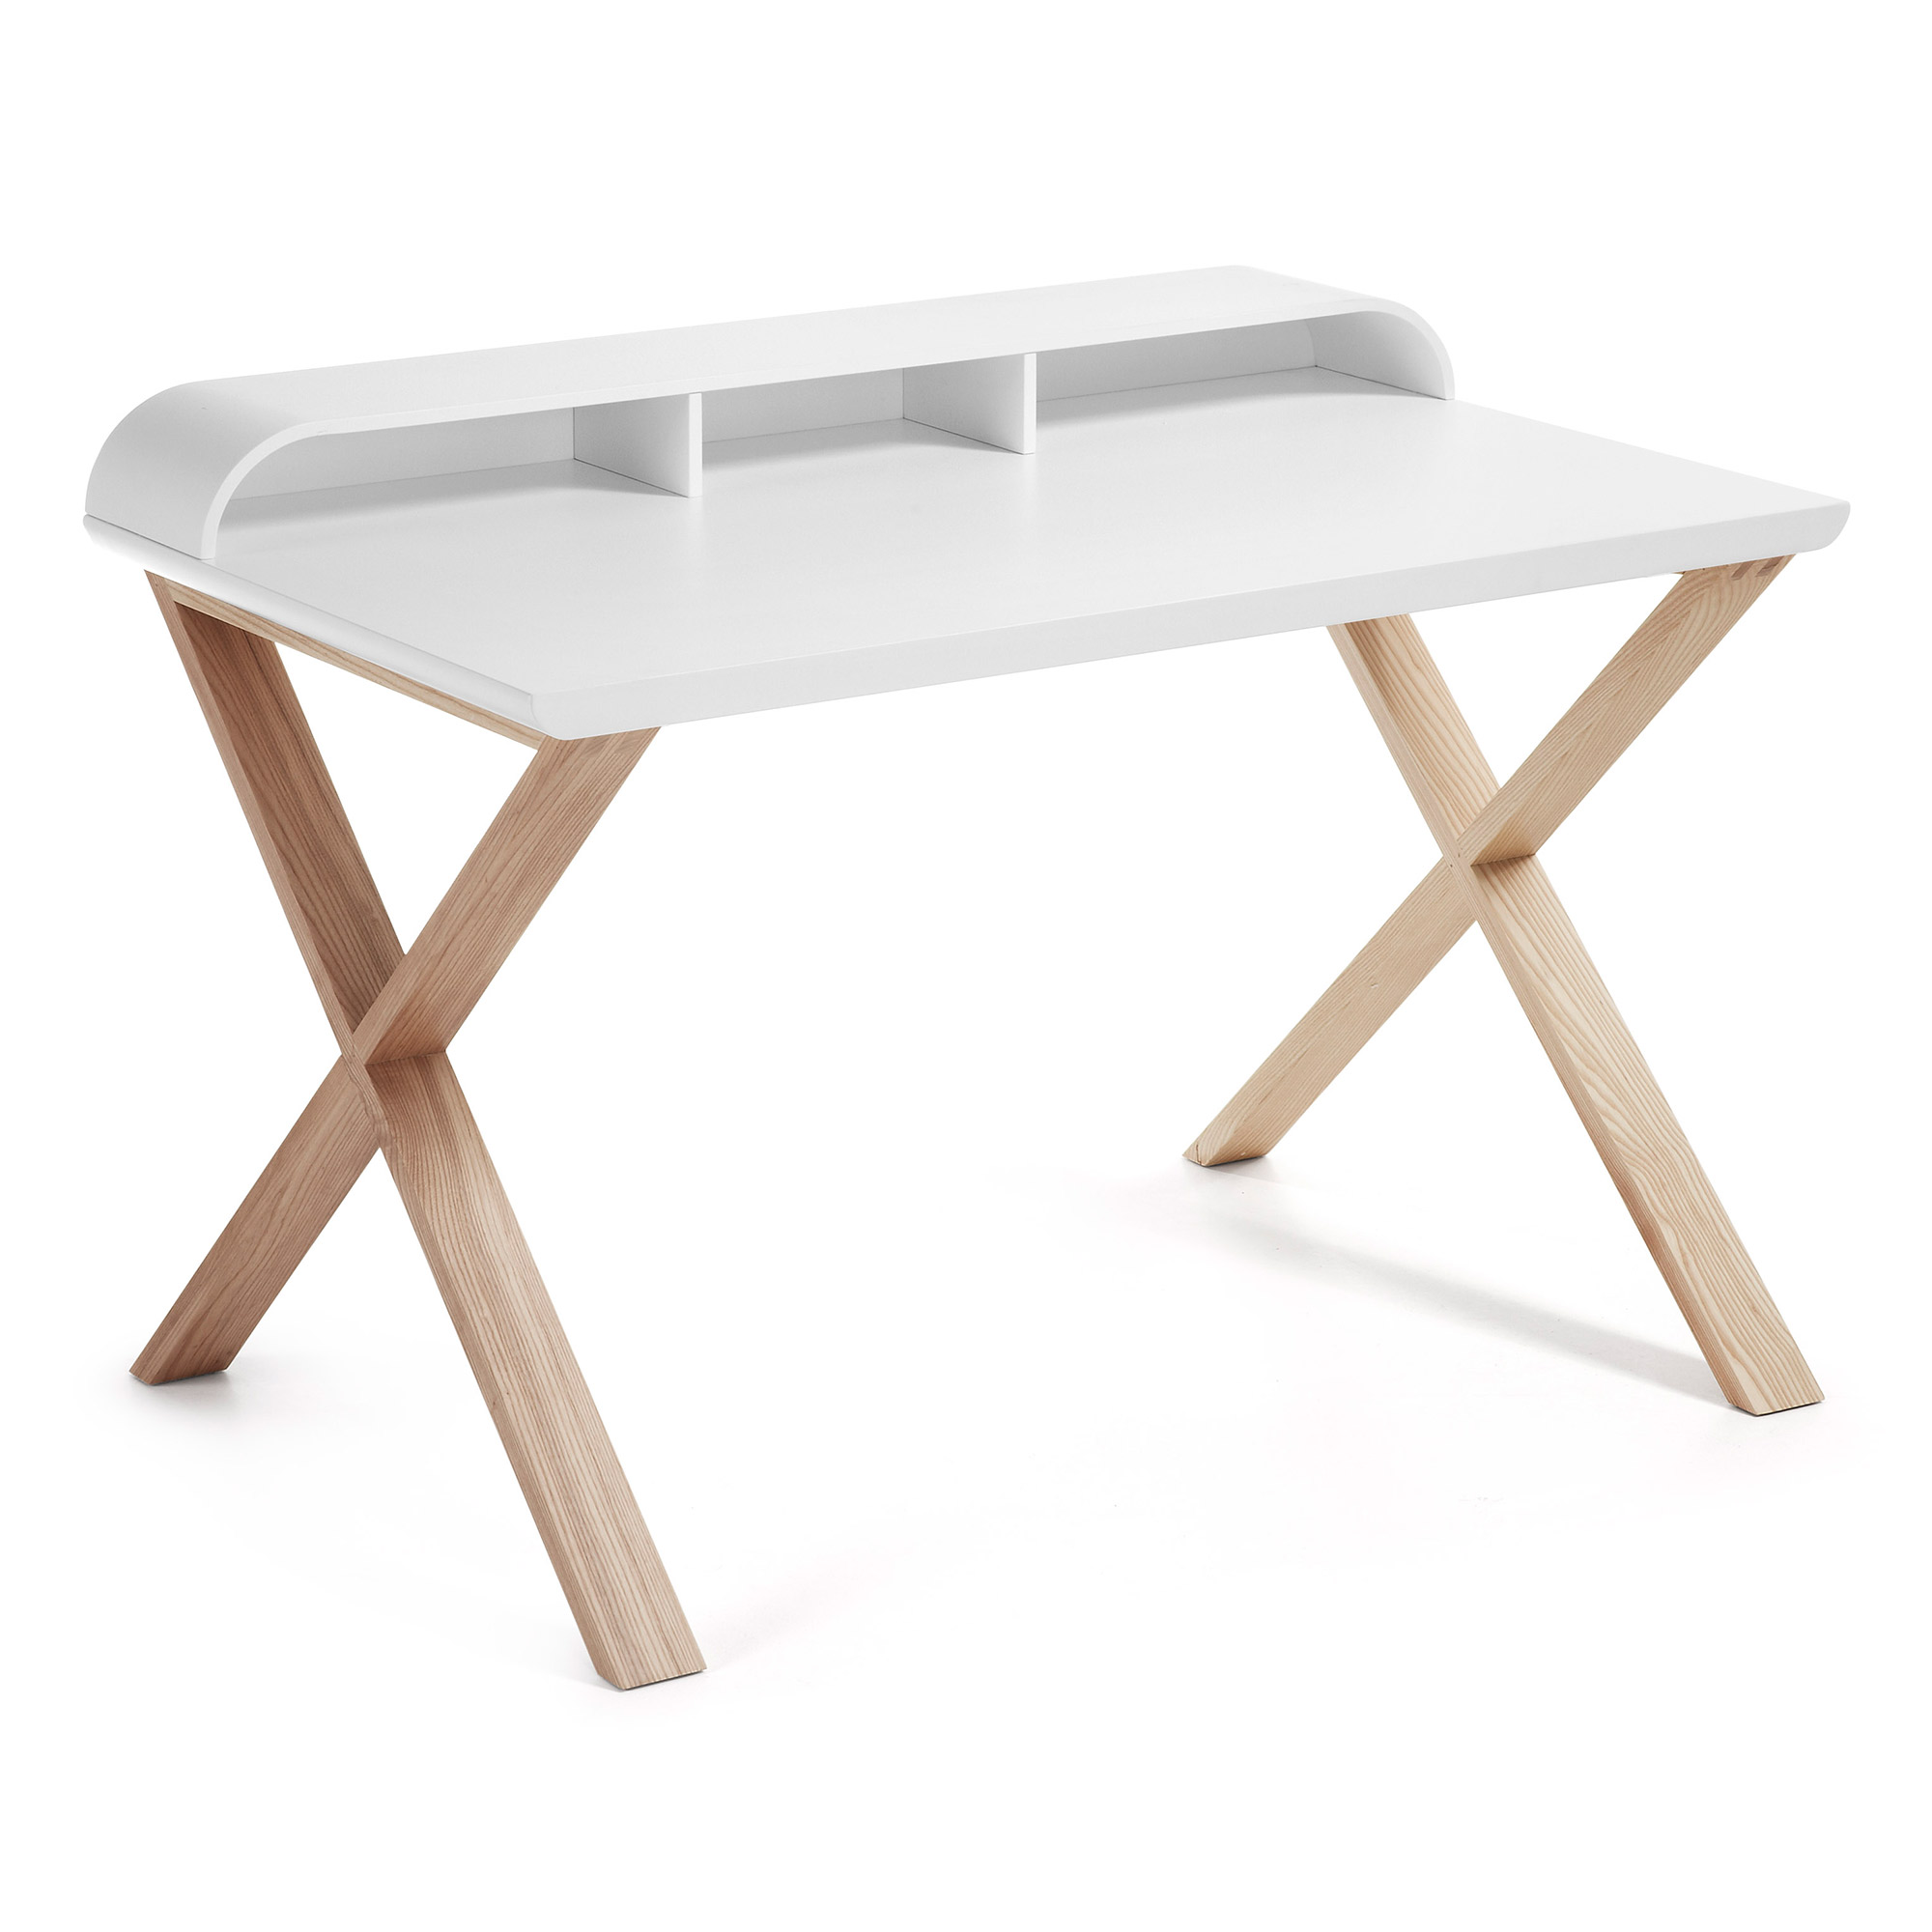 Mesa escritorio nordic blanco mate fresno 120x70